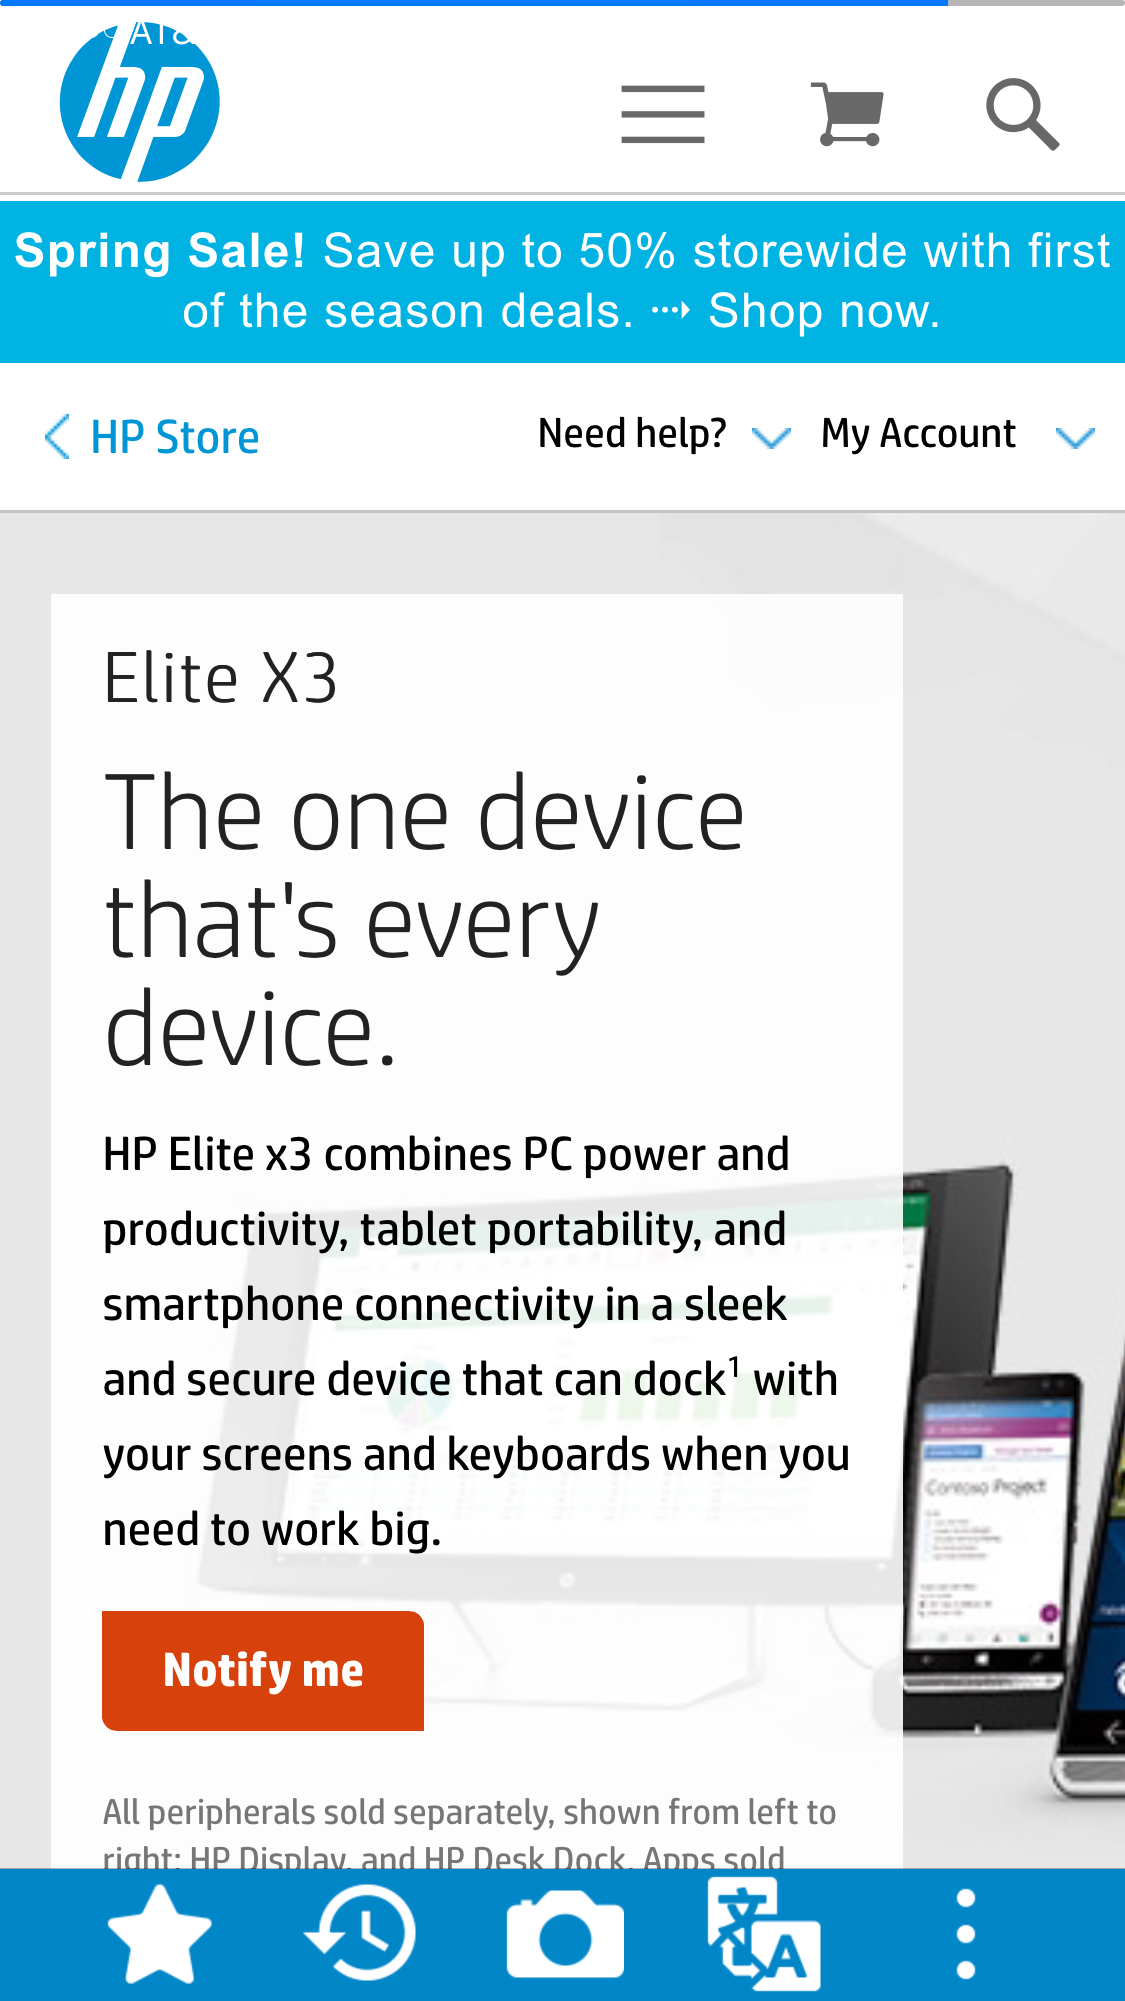 HP Elite X3のサイトへ行き、Notify me からメールアドレスを送る。